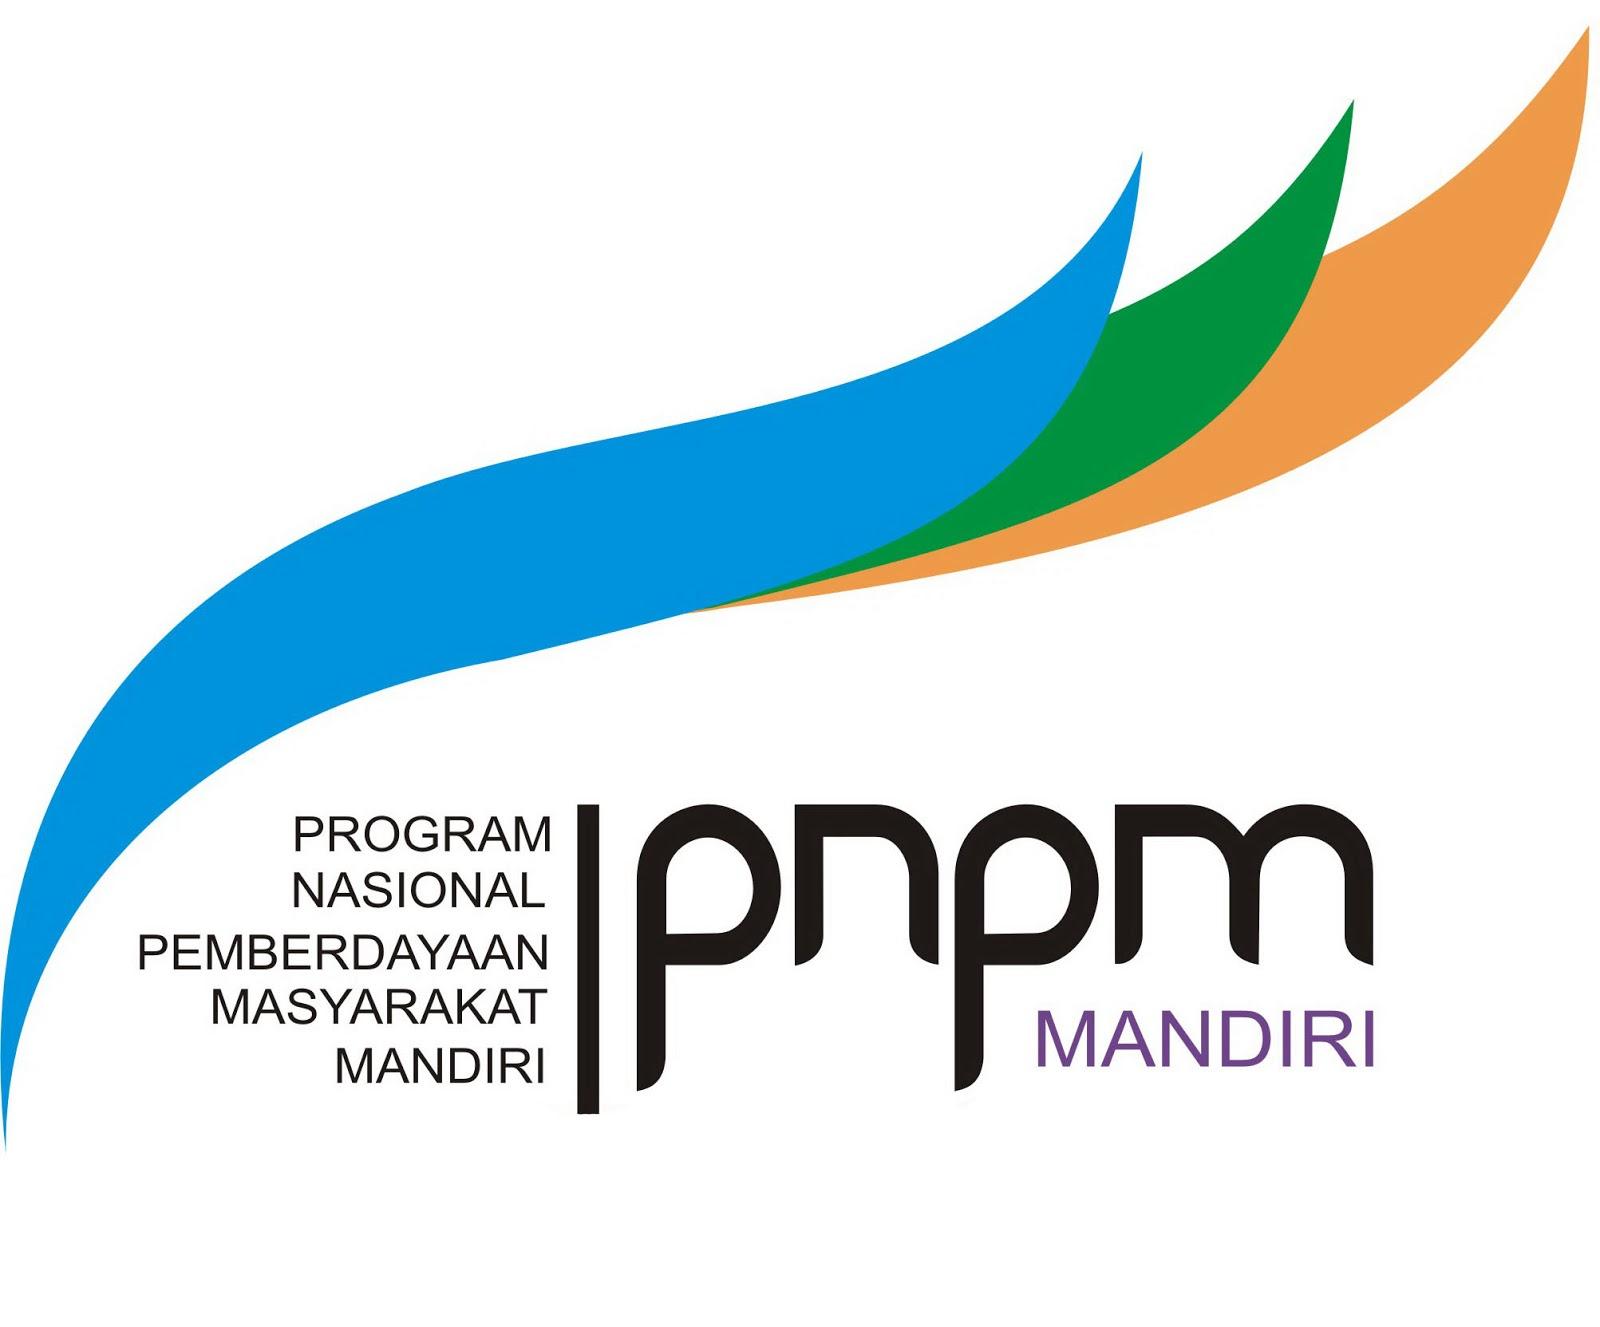 Loker Pnpm 2013 Aceh Lowongan Kerja Pnpm Maret 2013 Aceh Cpns Bumn Bank Lowongan Kerja Pnpm Mandiri Perdesaan Riau 2013 Lowongan Kerja 2013